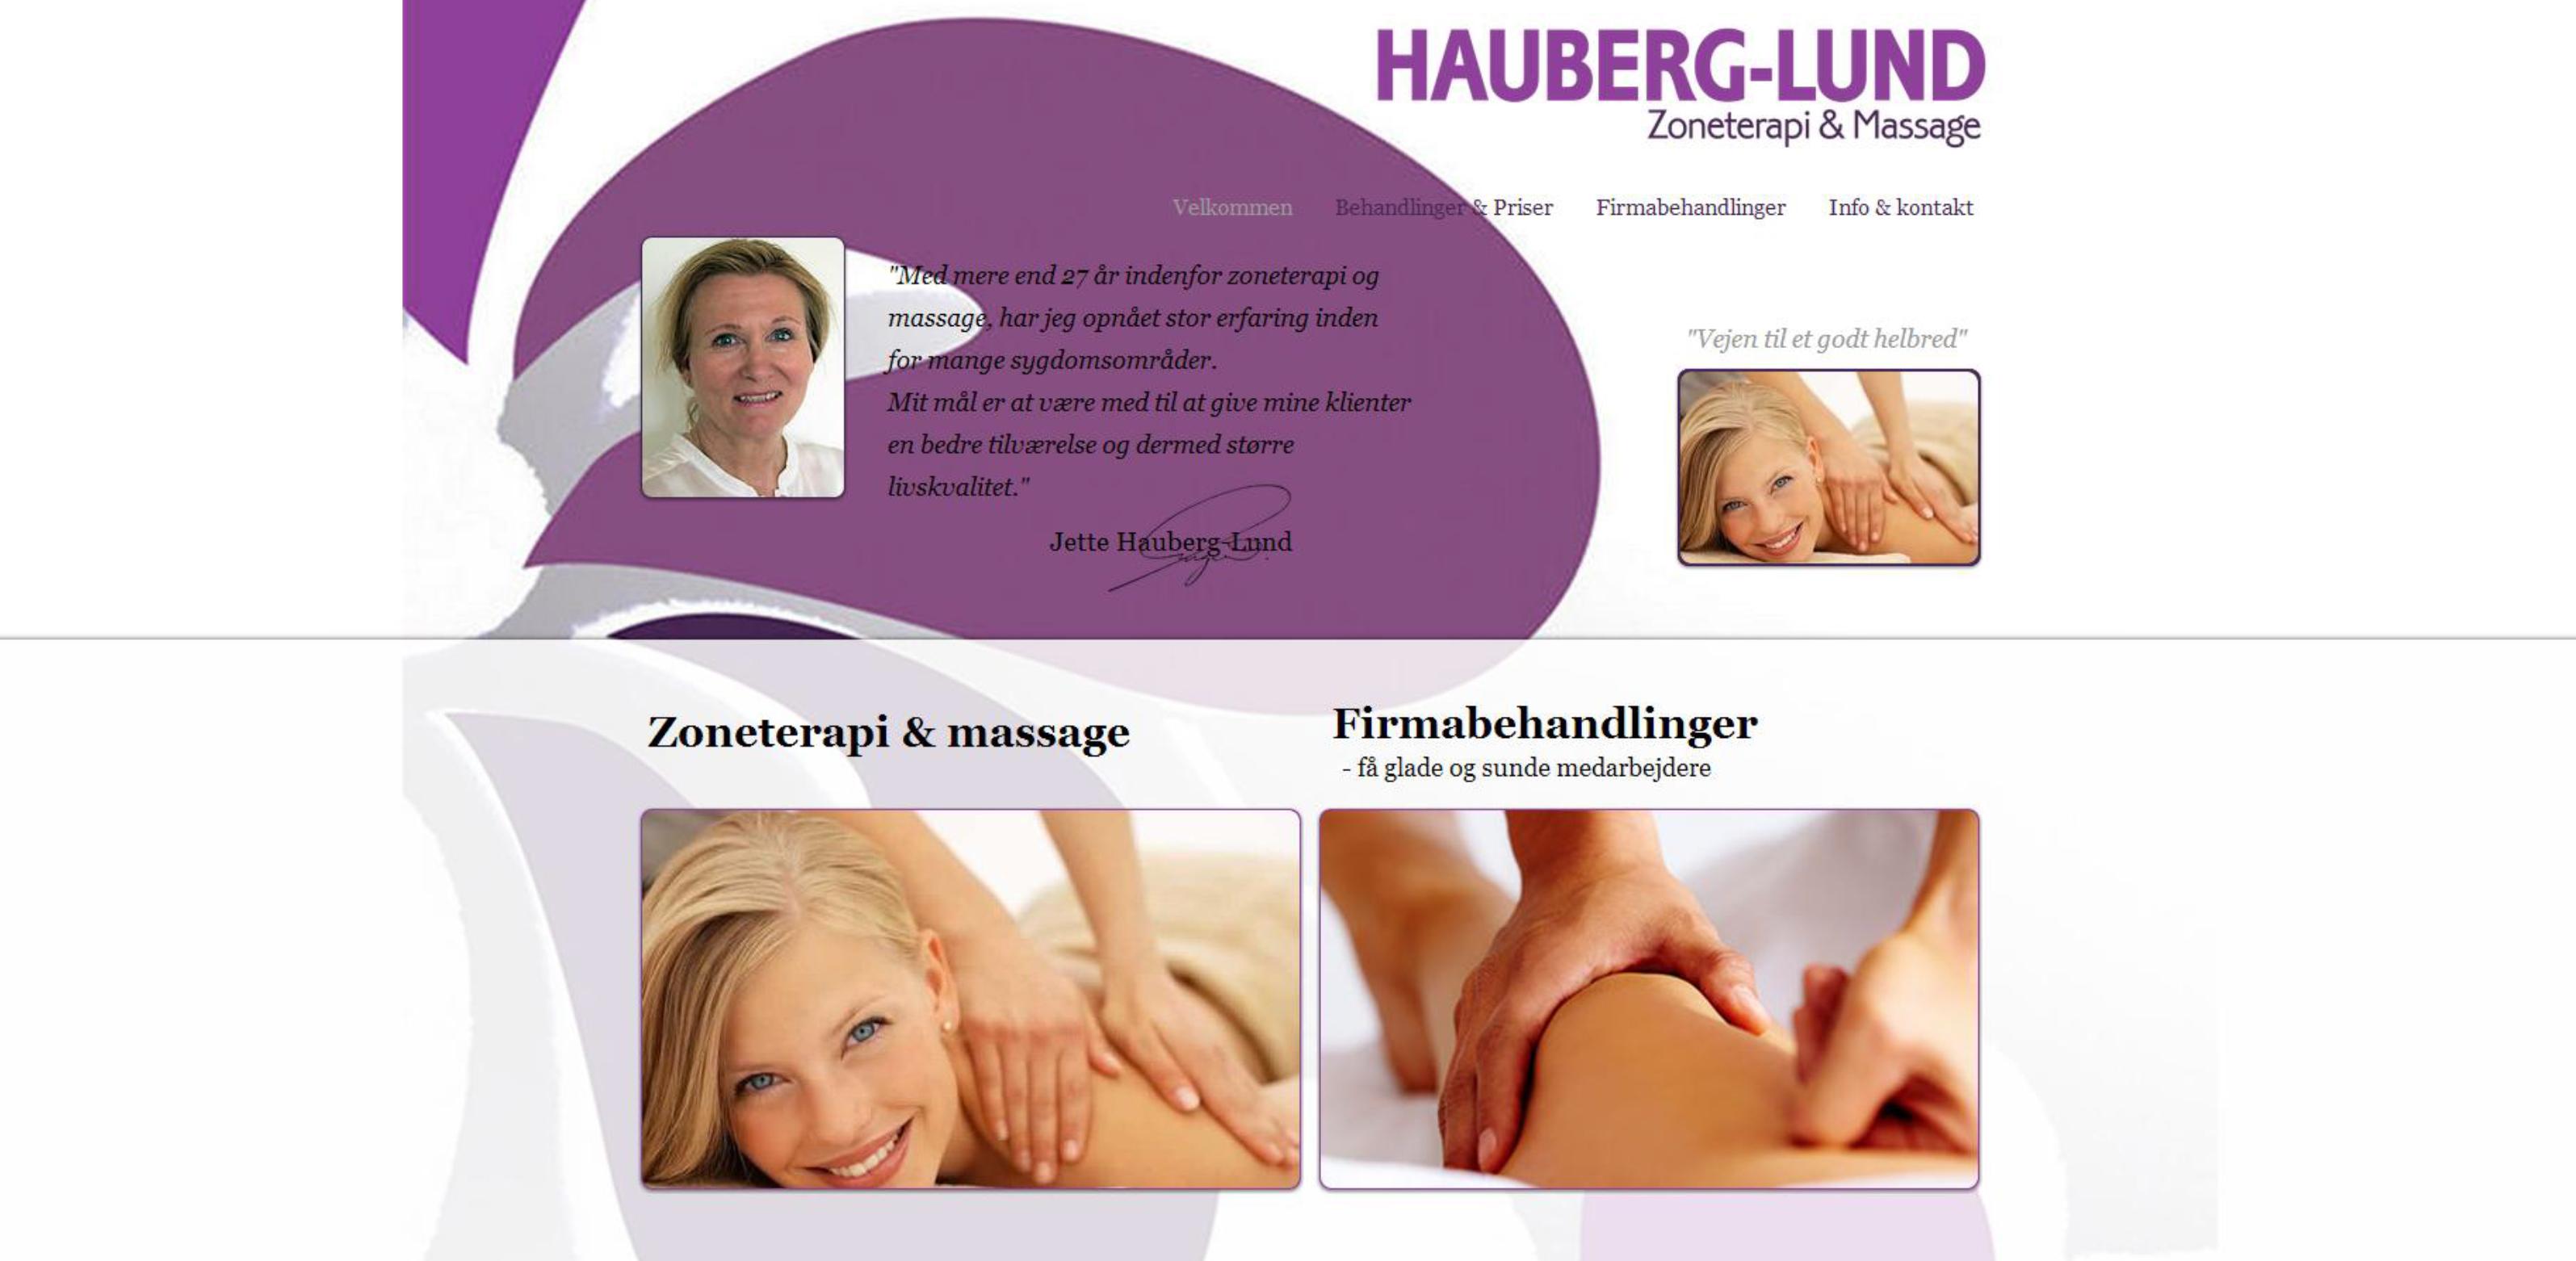 Hauberg-Lund Zoneterapi- & massage